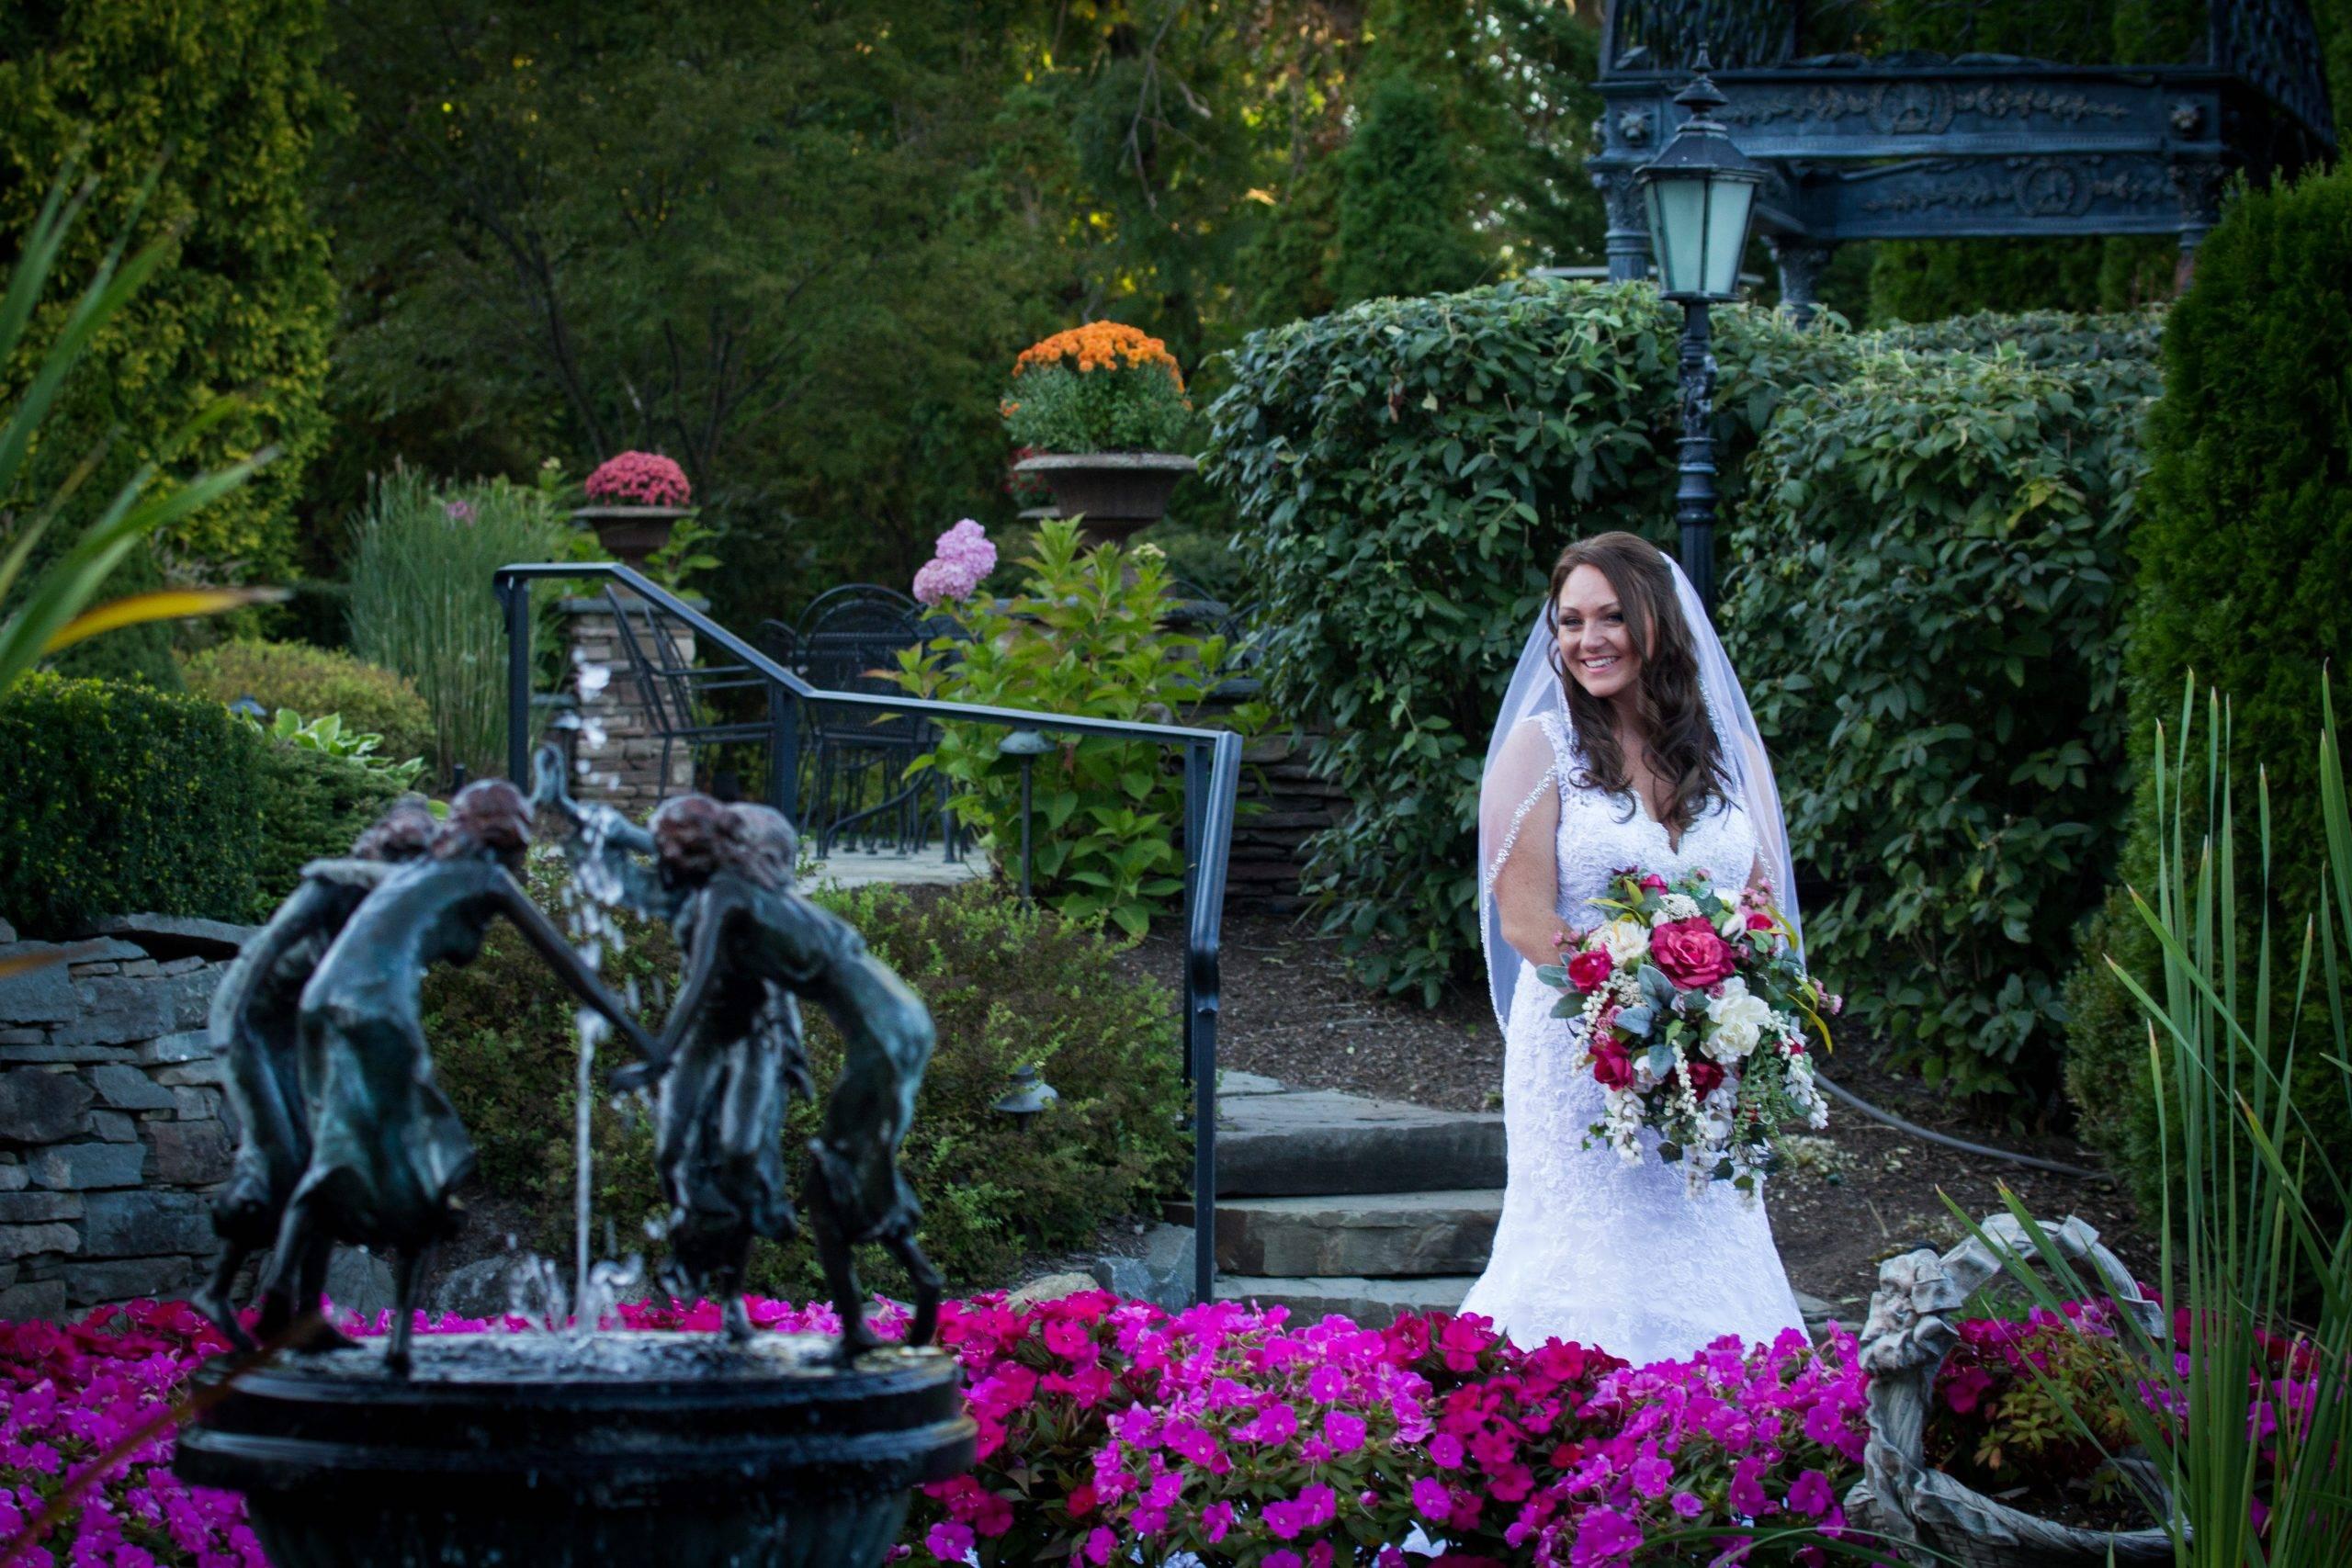 Park Savoy bride by fountain